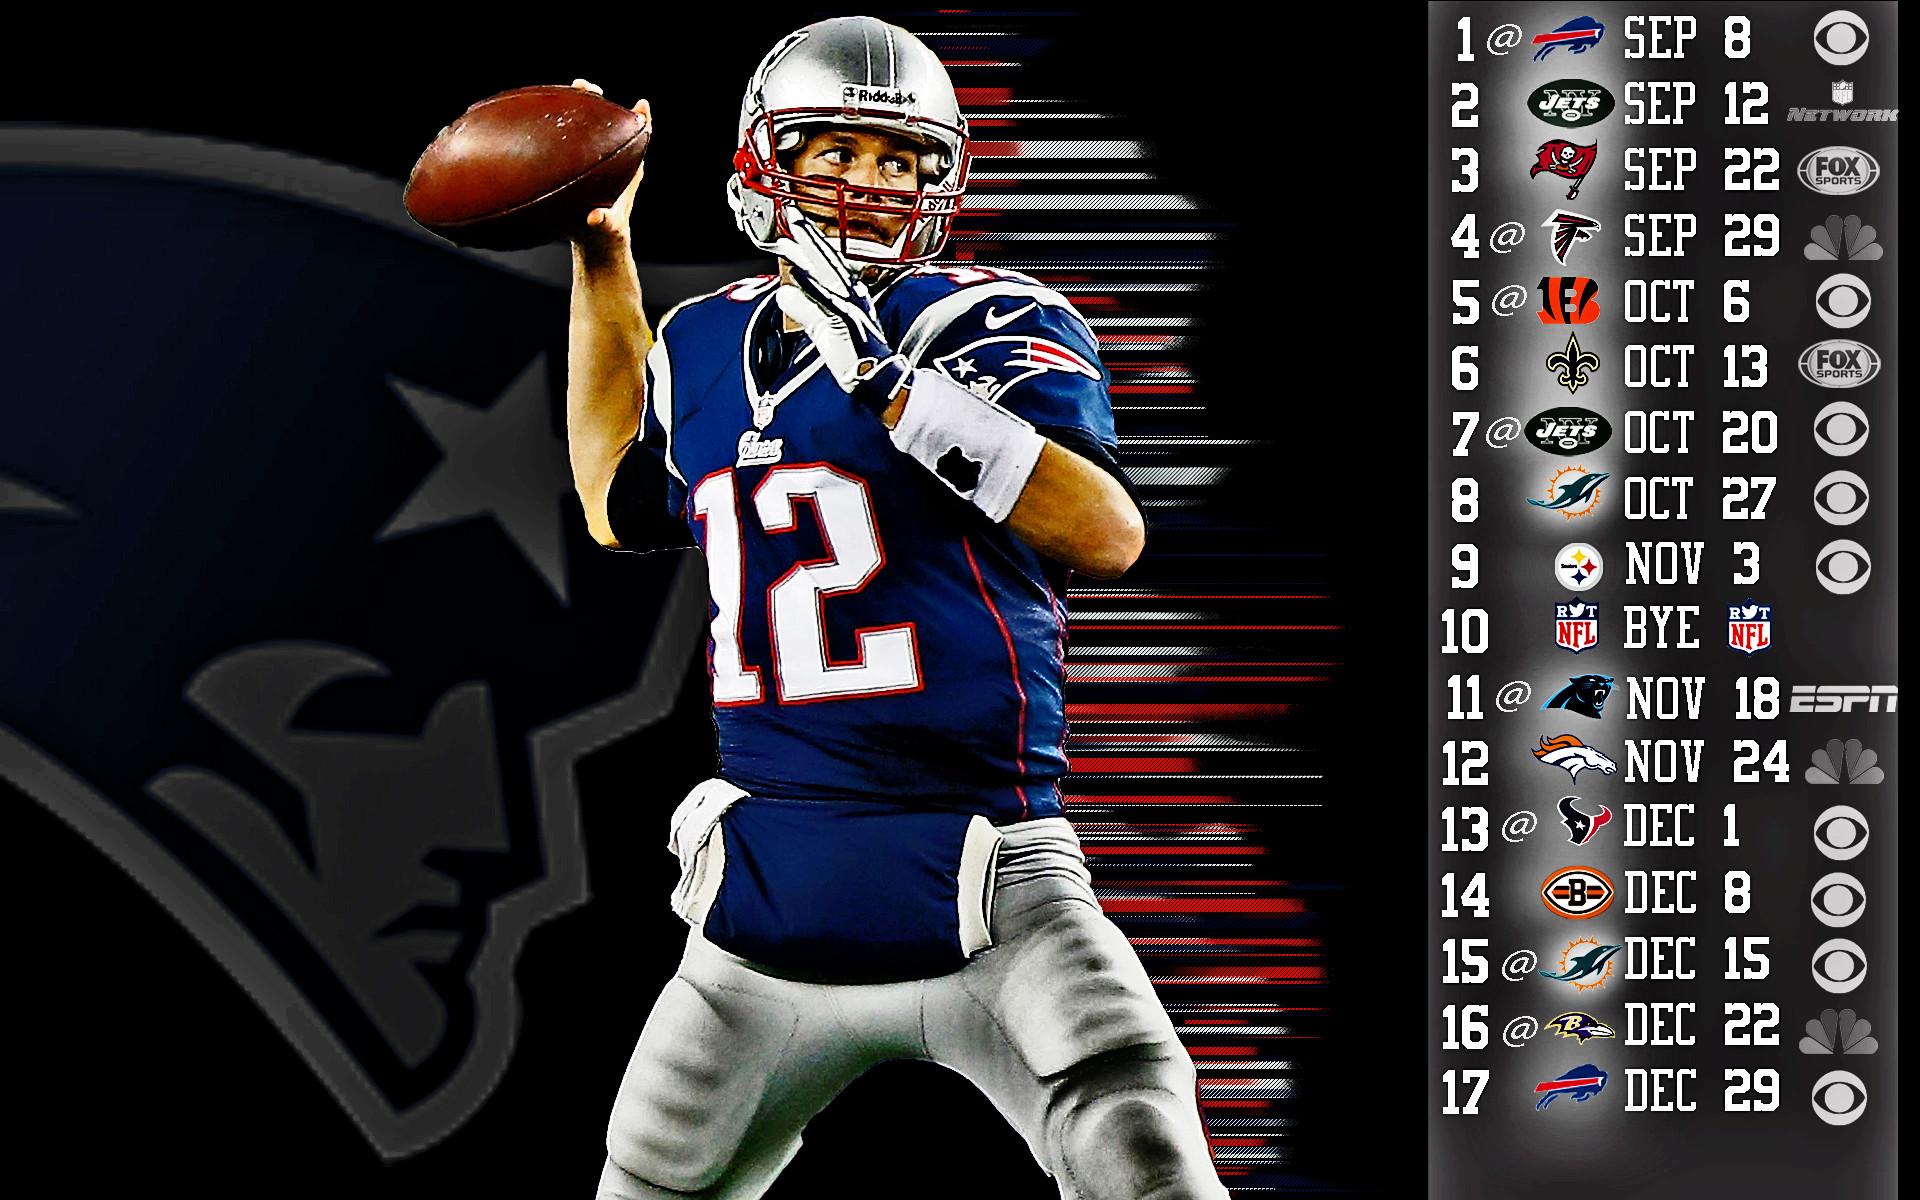 New England Patriots. Tom Brady 2013 Wallpaper HDR